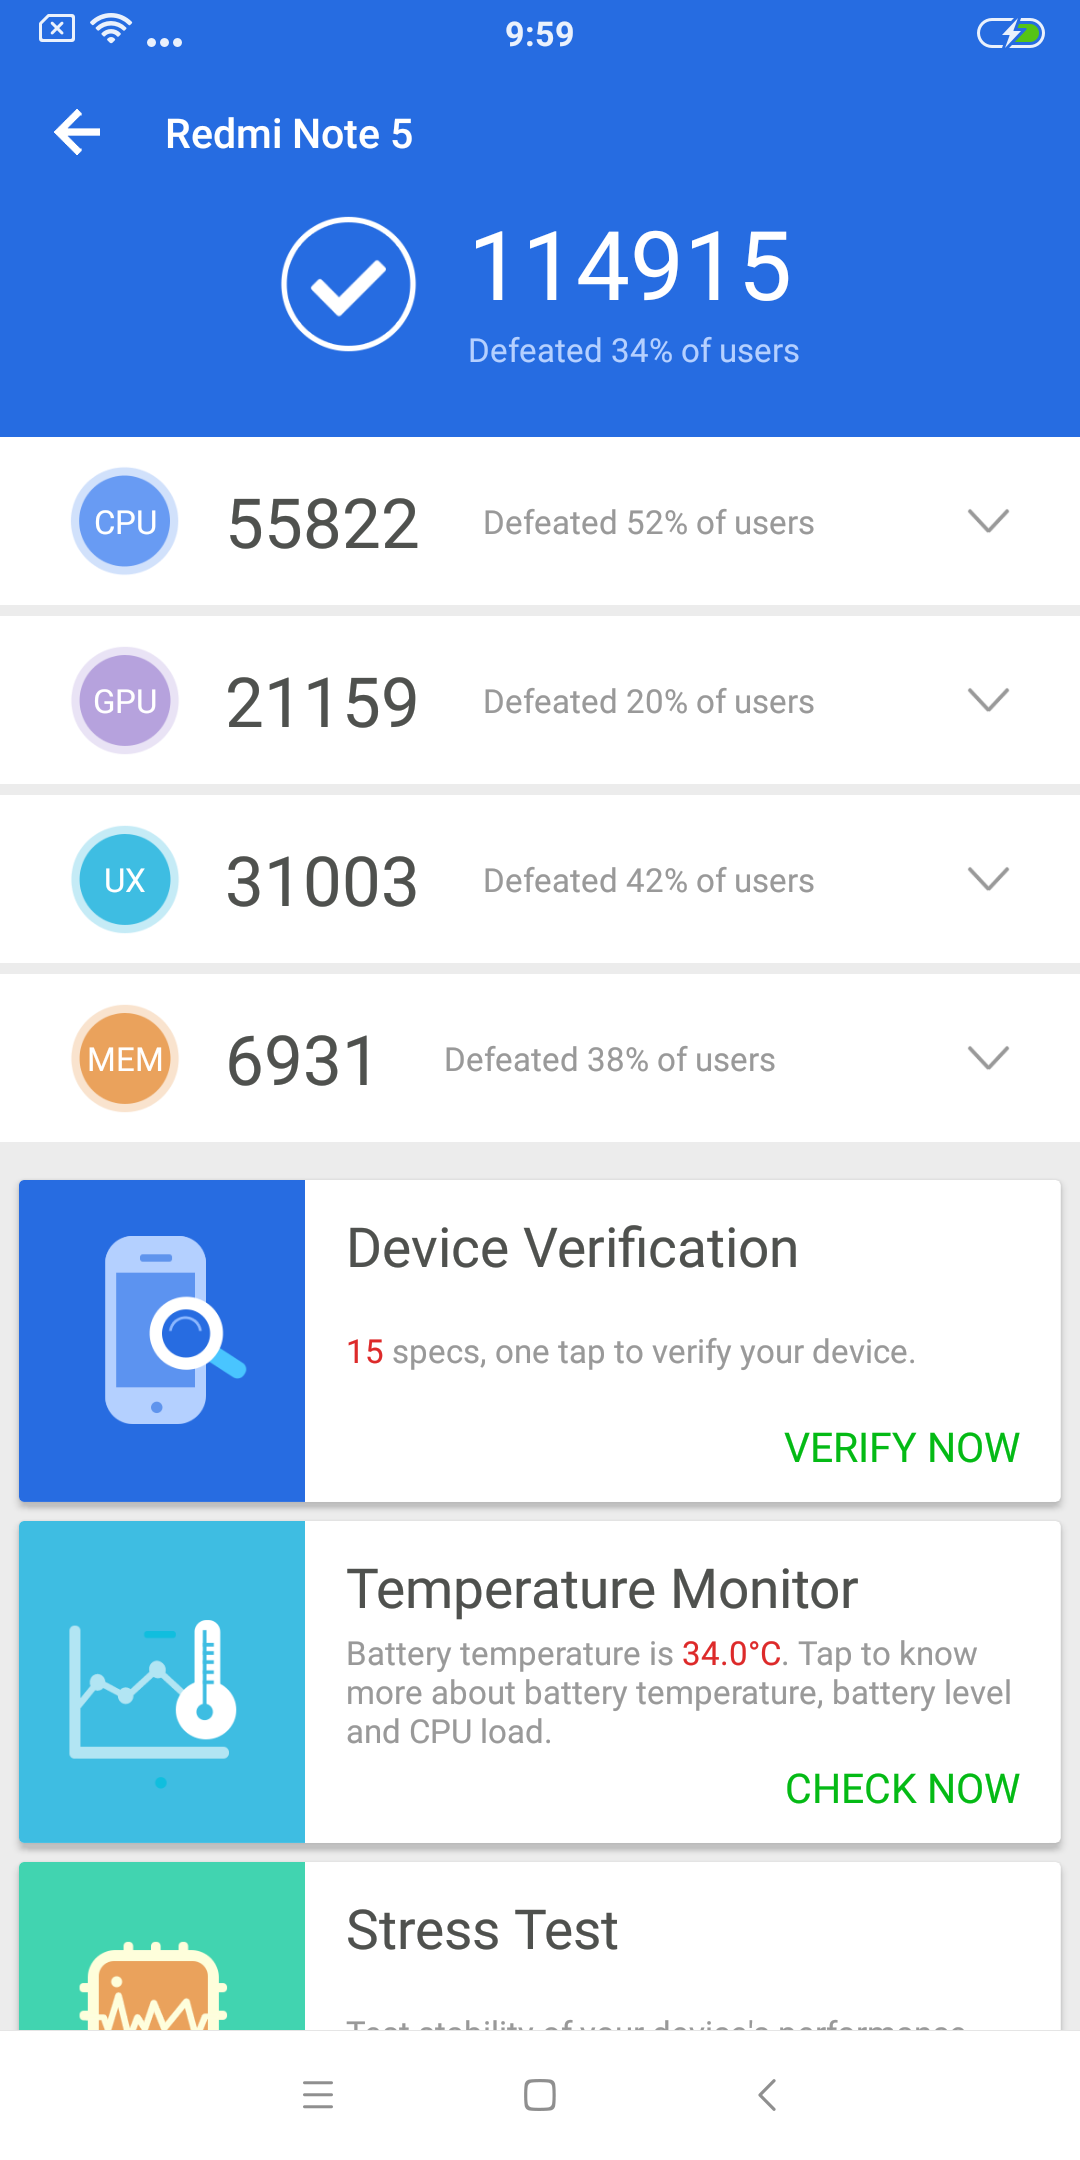 mi-globe_performance_review_redminote5_wifi